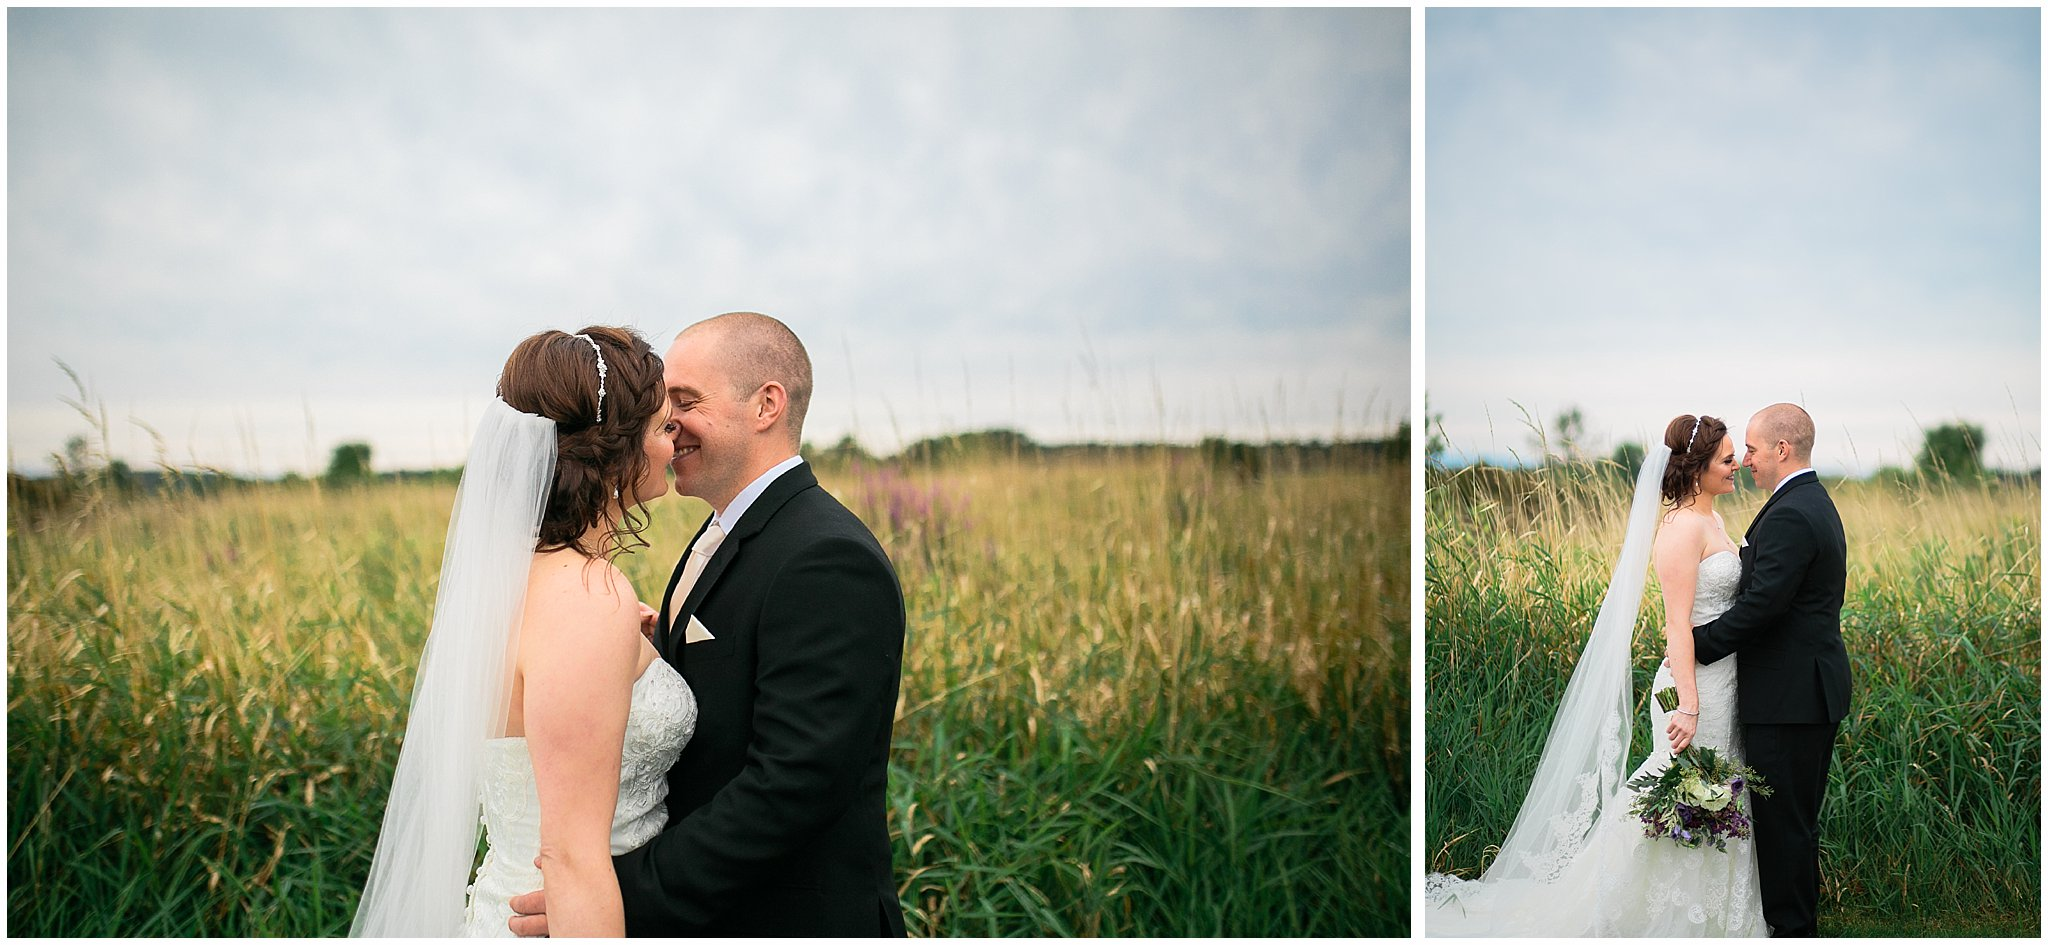 Links at Unionvale Wedding Lagrangeville Wedding Hudson Valley Wedding Photographer Sweet Alice Photography46.jpg